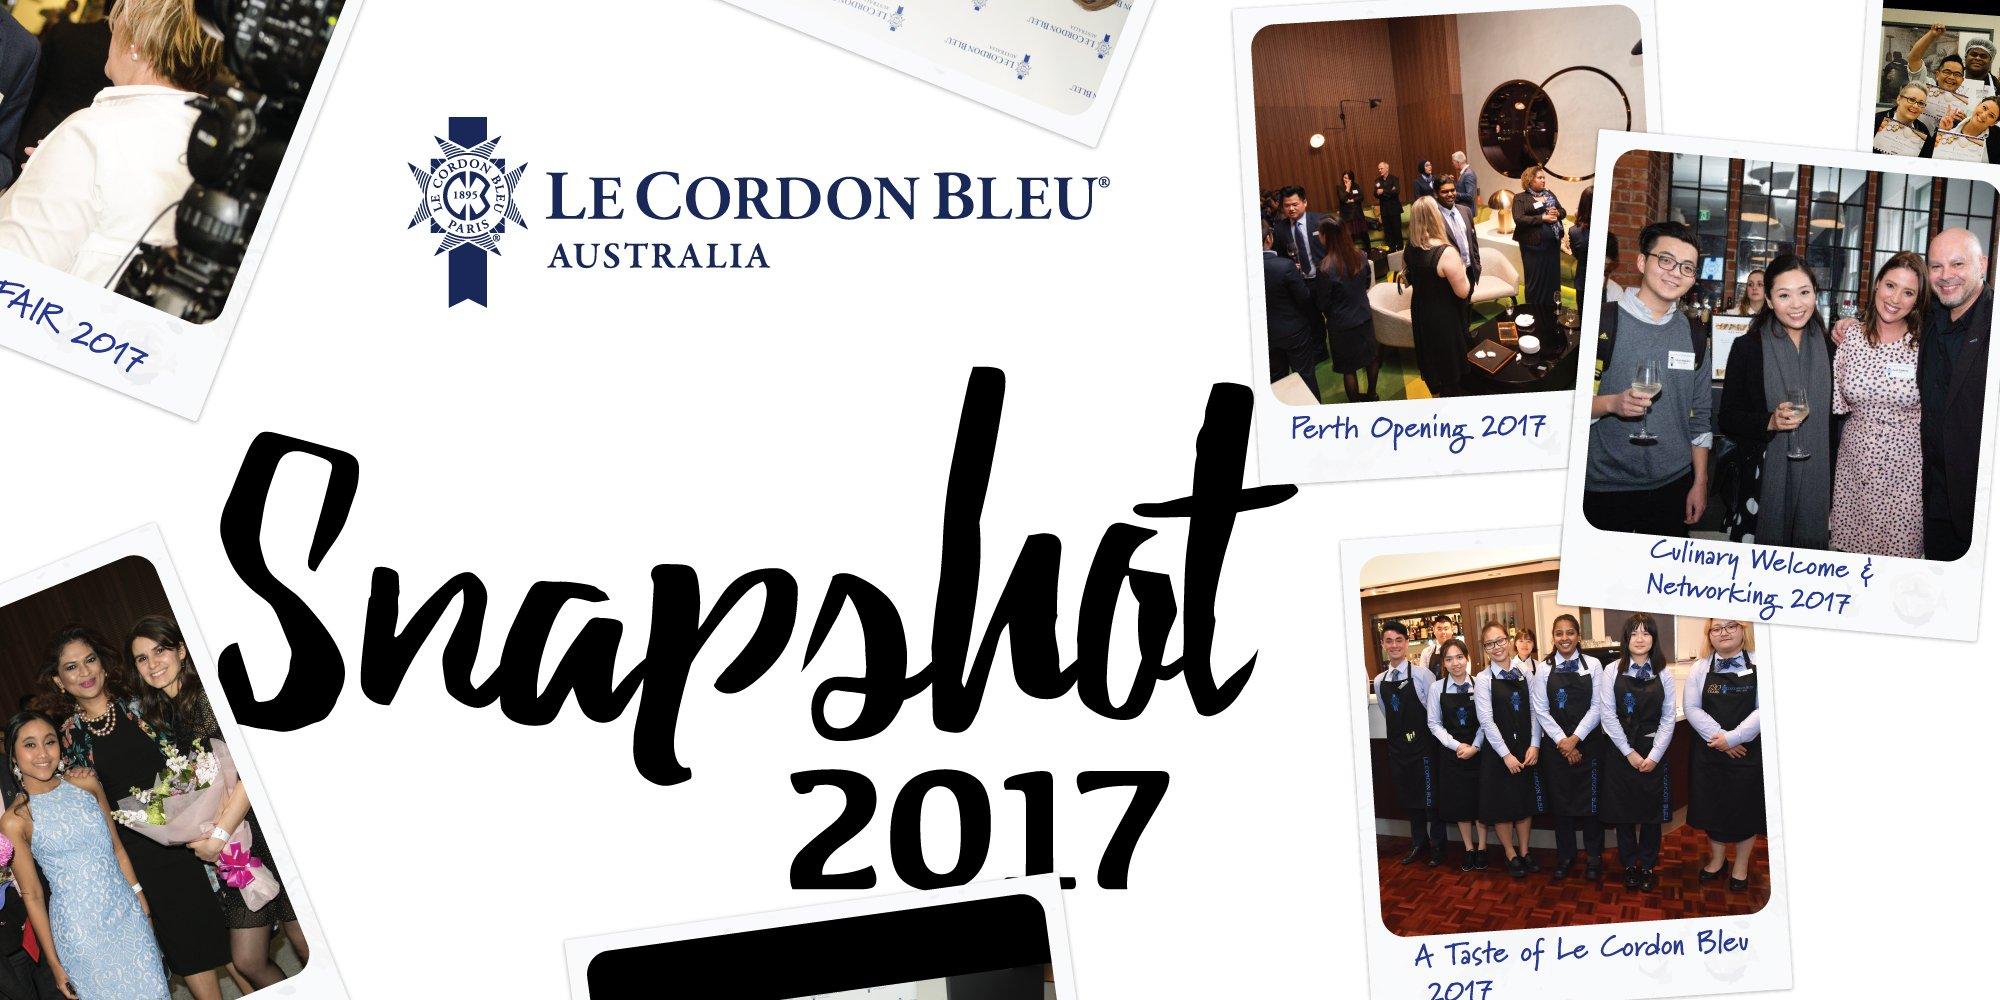 Le Cordon Bleu Australia: A snapshot of 2017